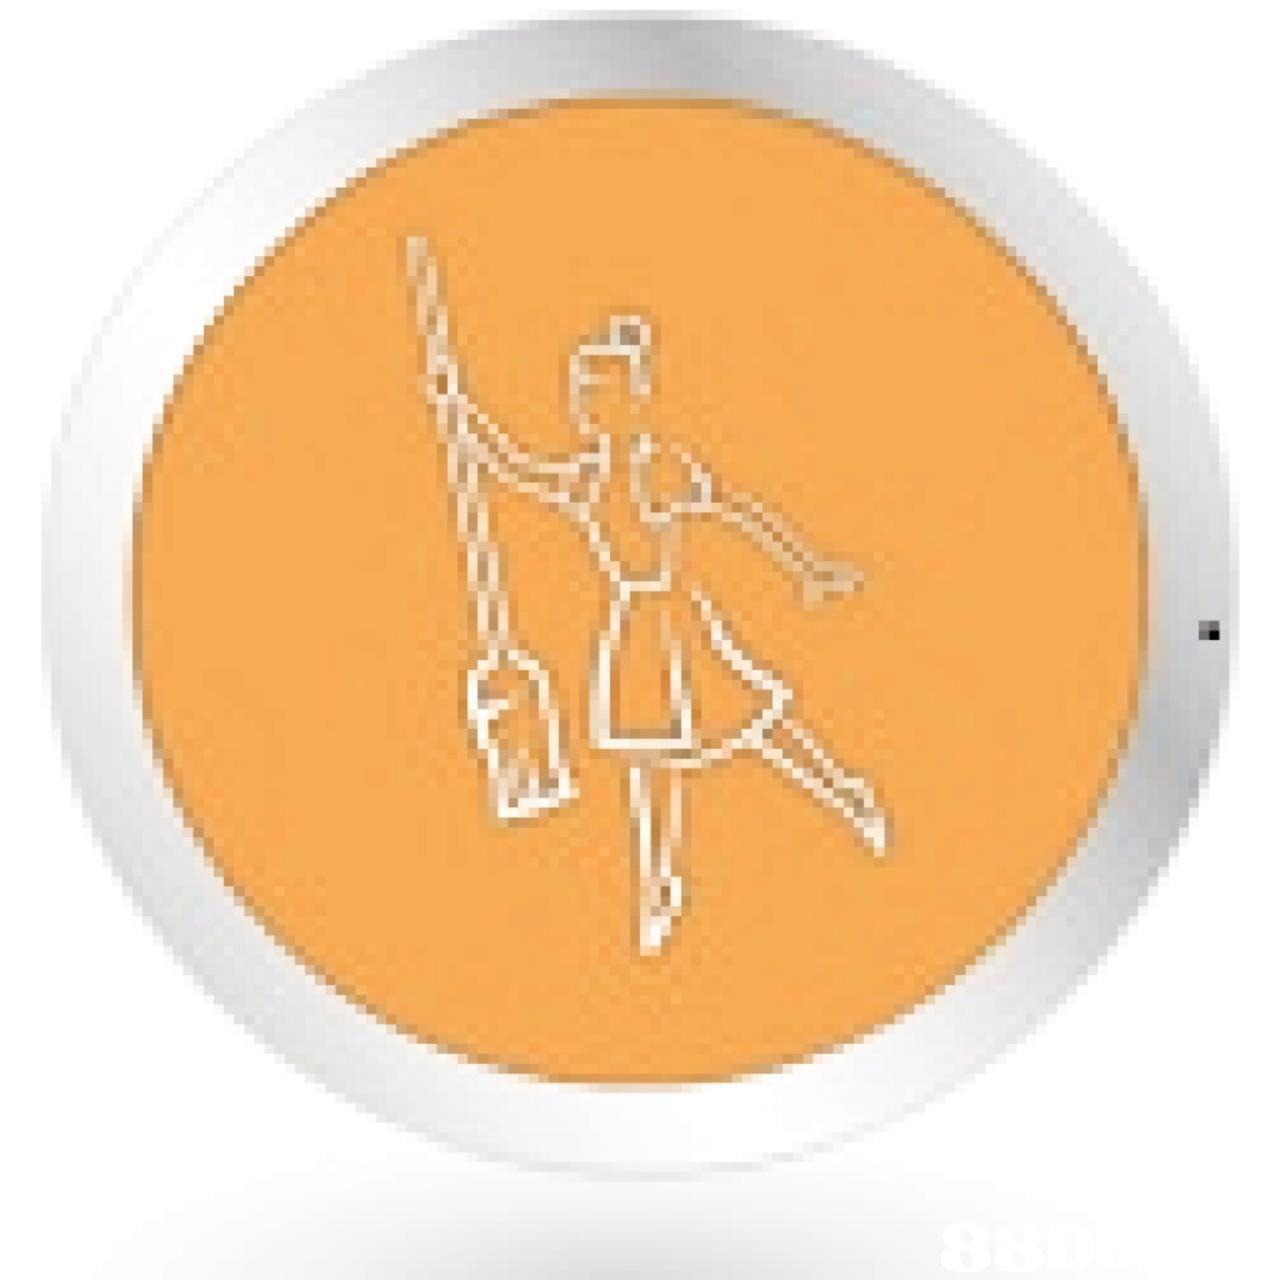 Orange,Illustration,